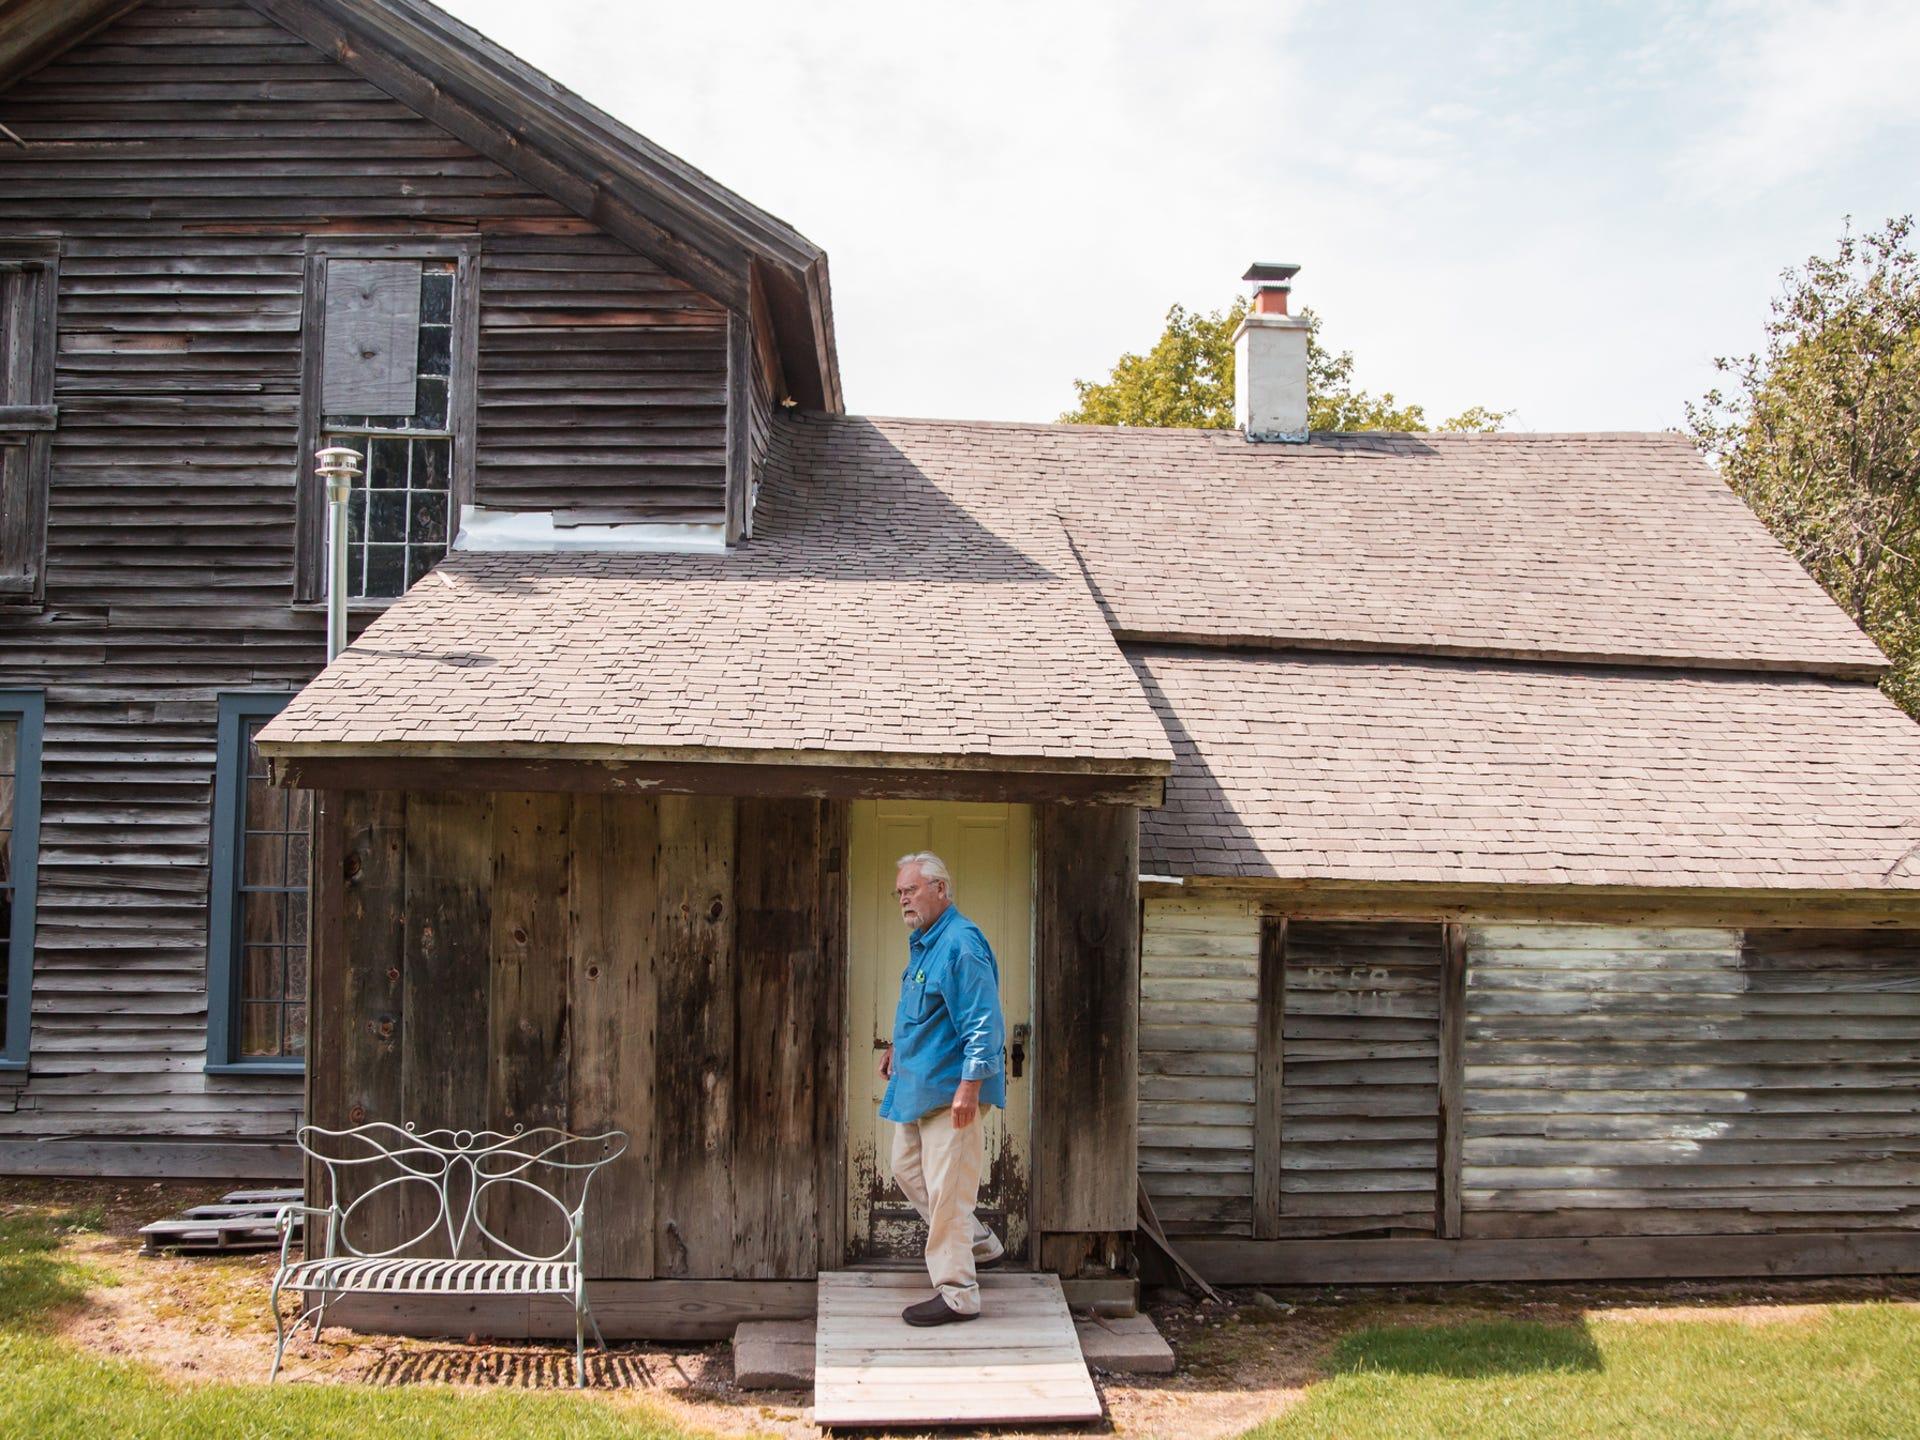 Jim Vivian, 74, steps out of a refurbished miner's